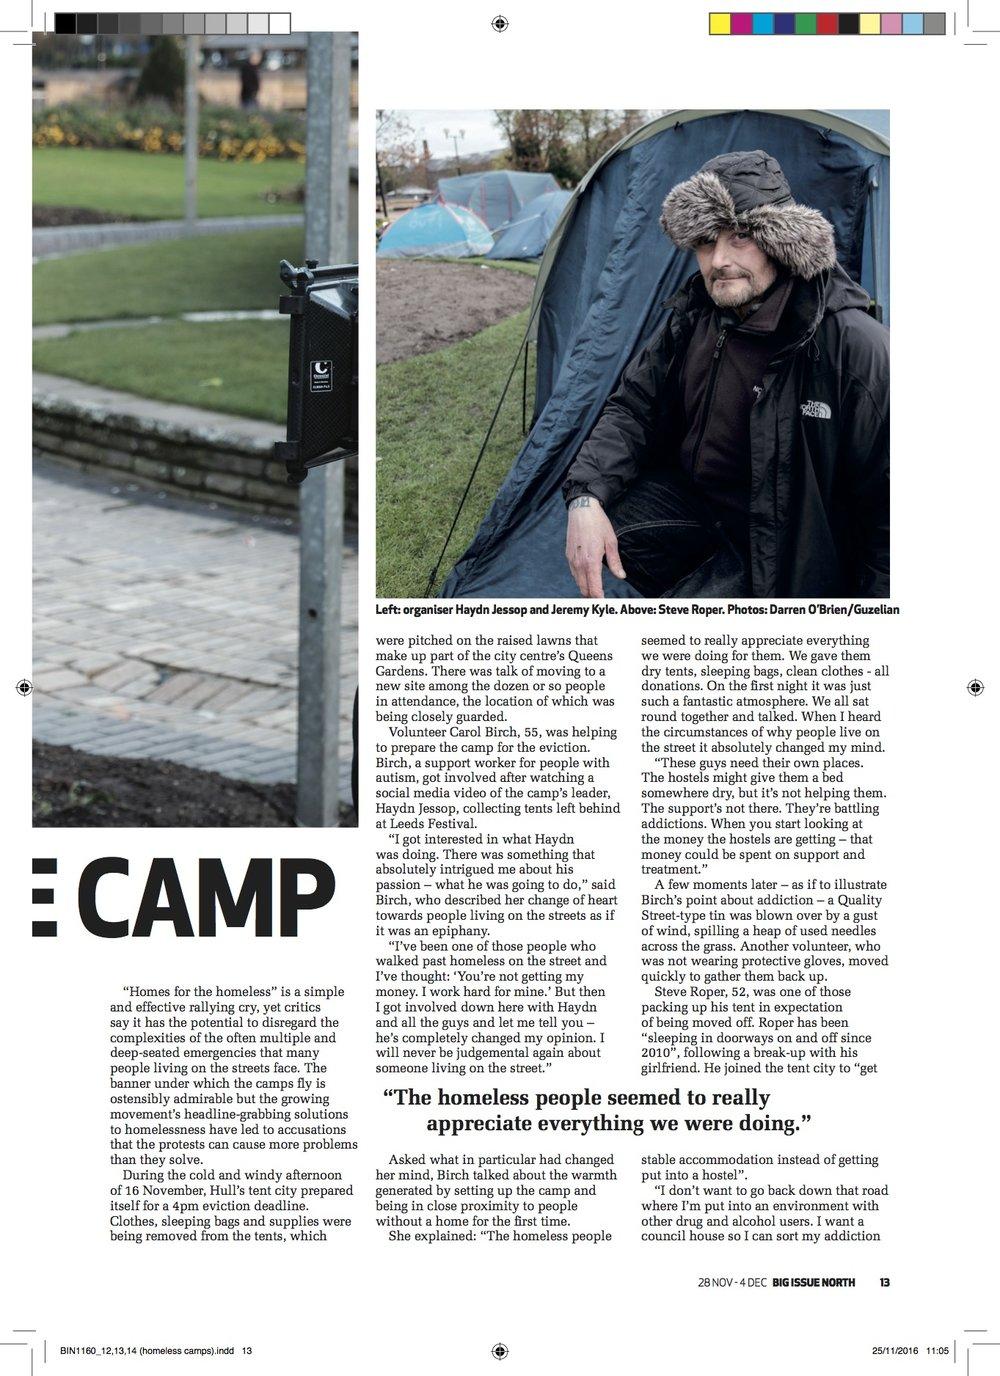 Hull Tent city 2.jpg